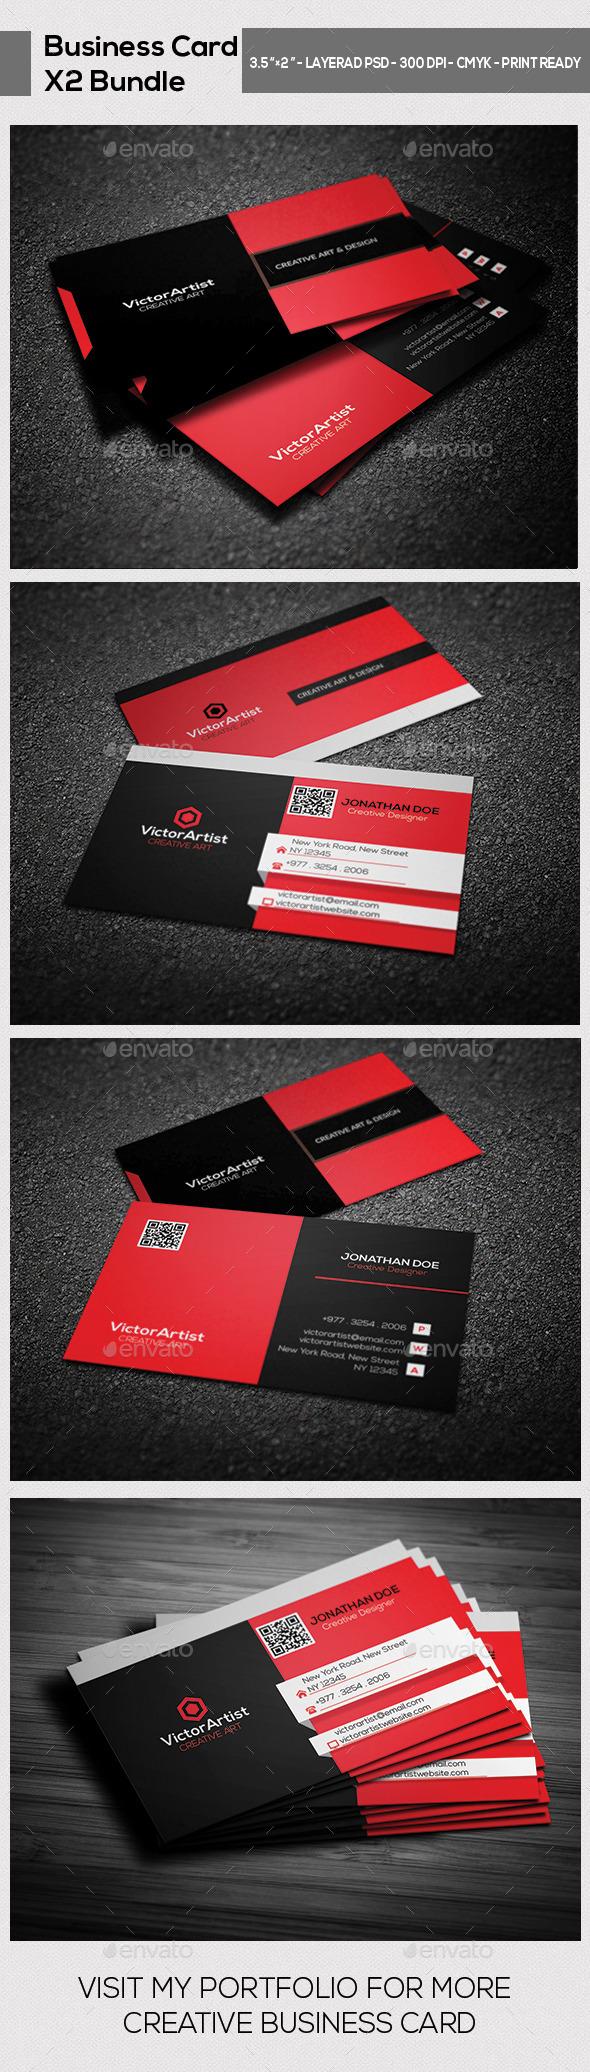 X2 Creative Business Card Bundle 02 - Creative Business Cards